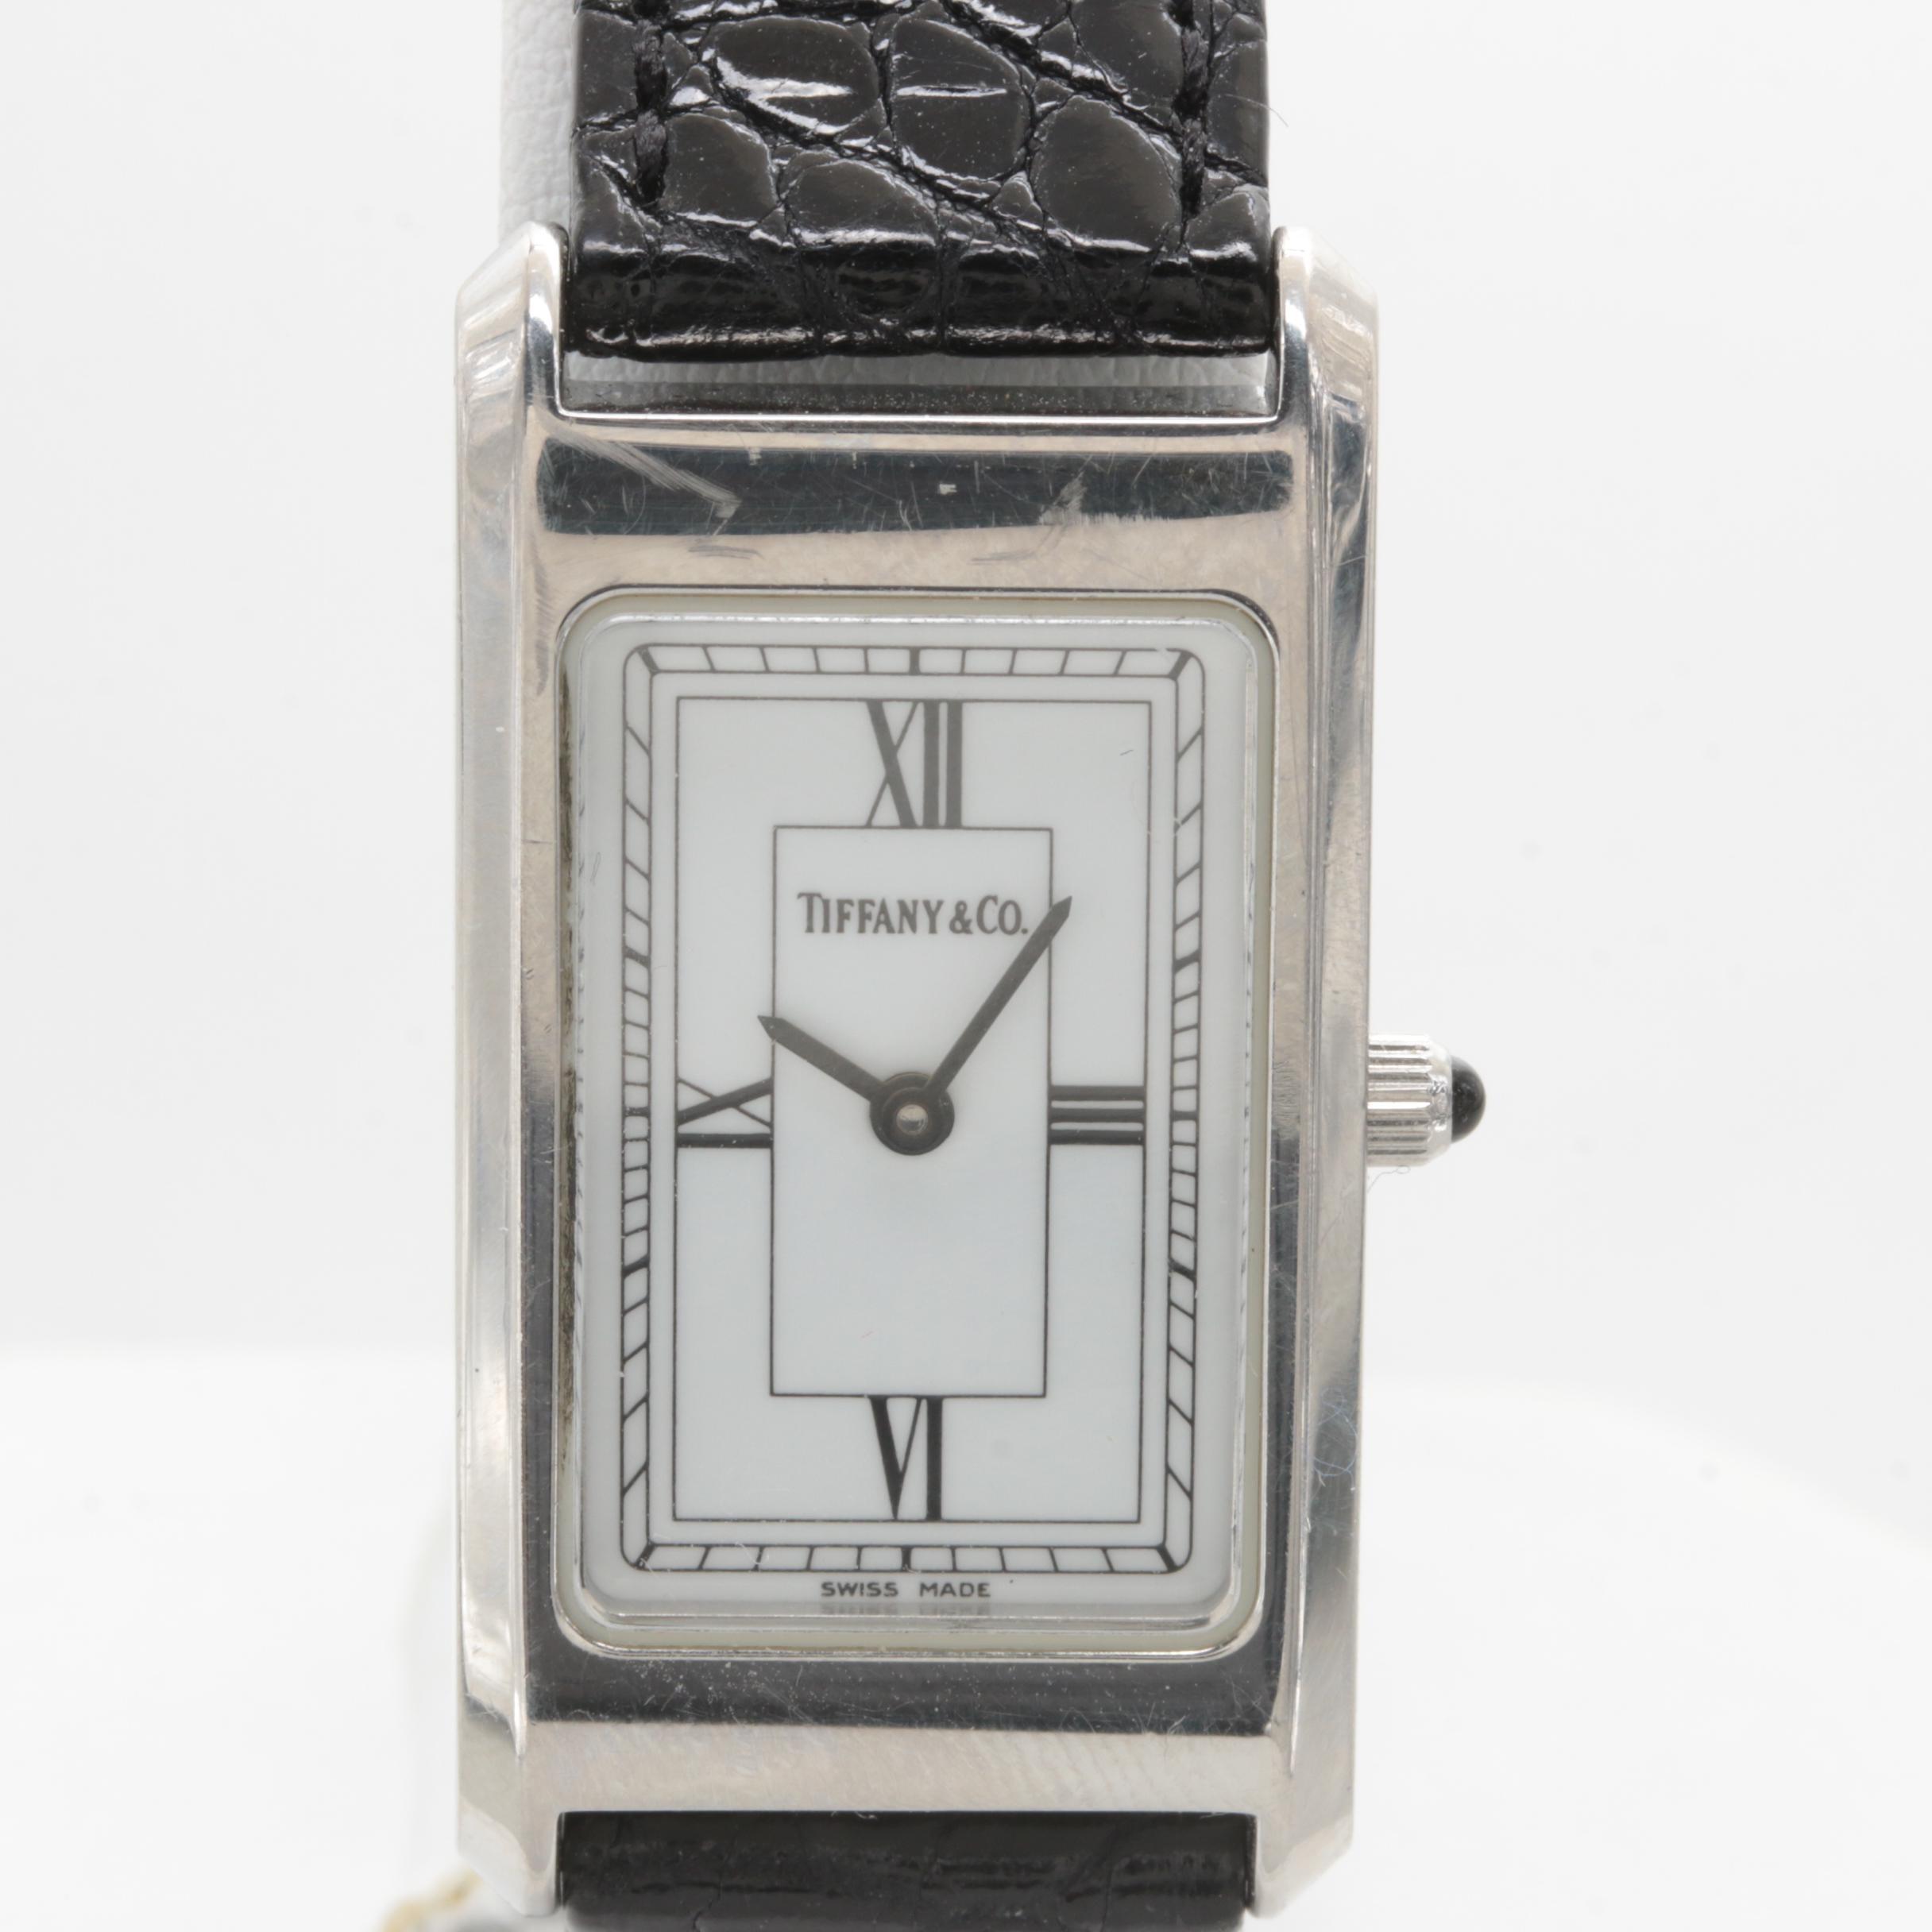 Tiffany & Co. Stainless Steel Wristwatch